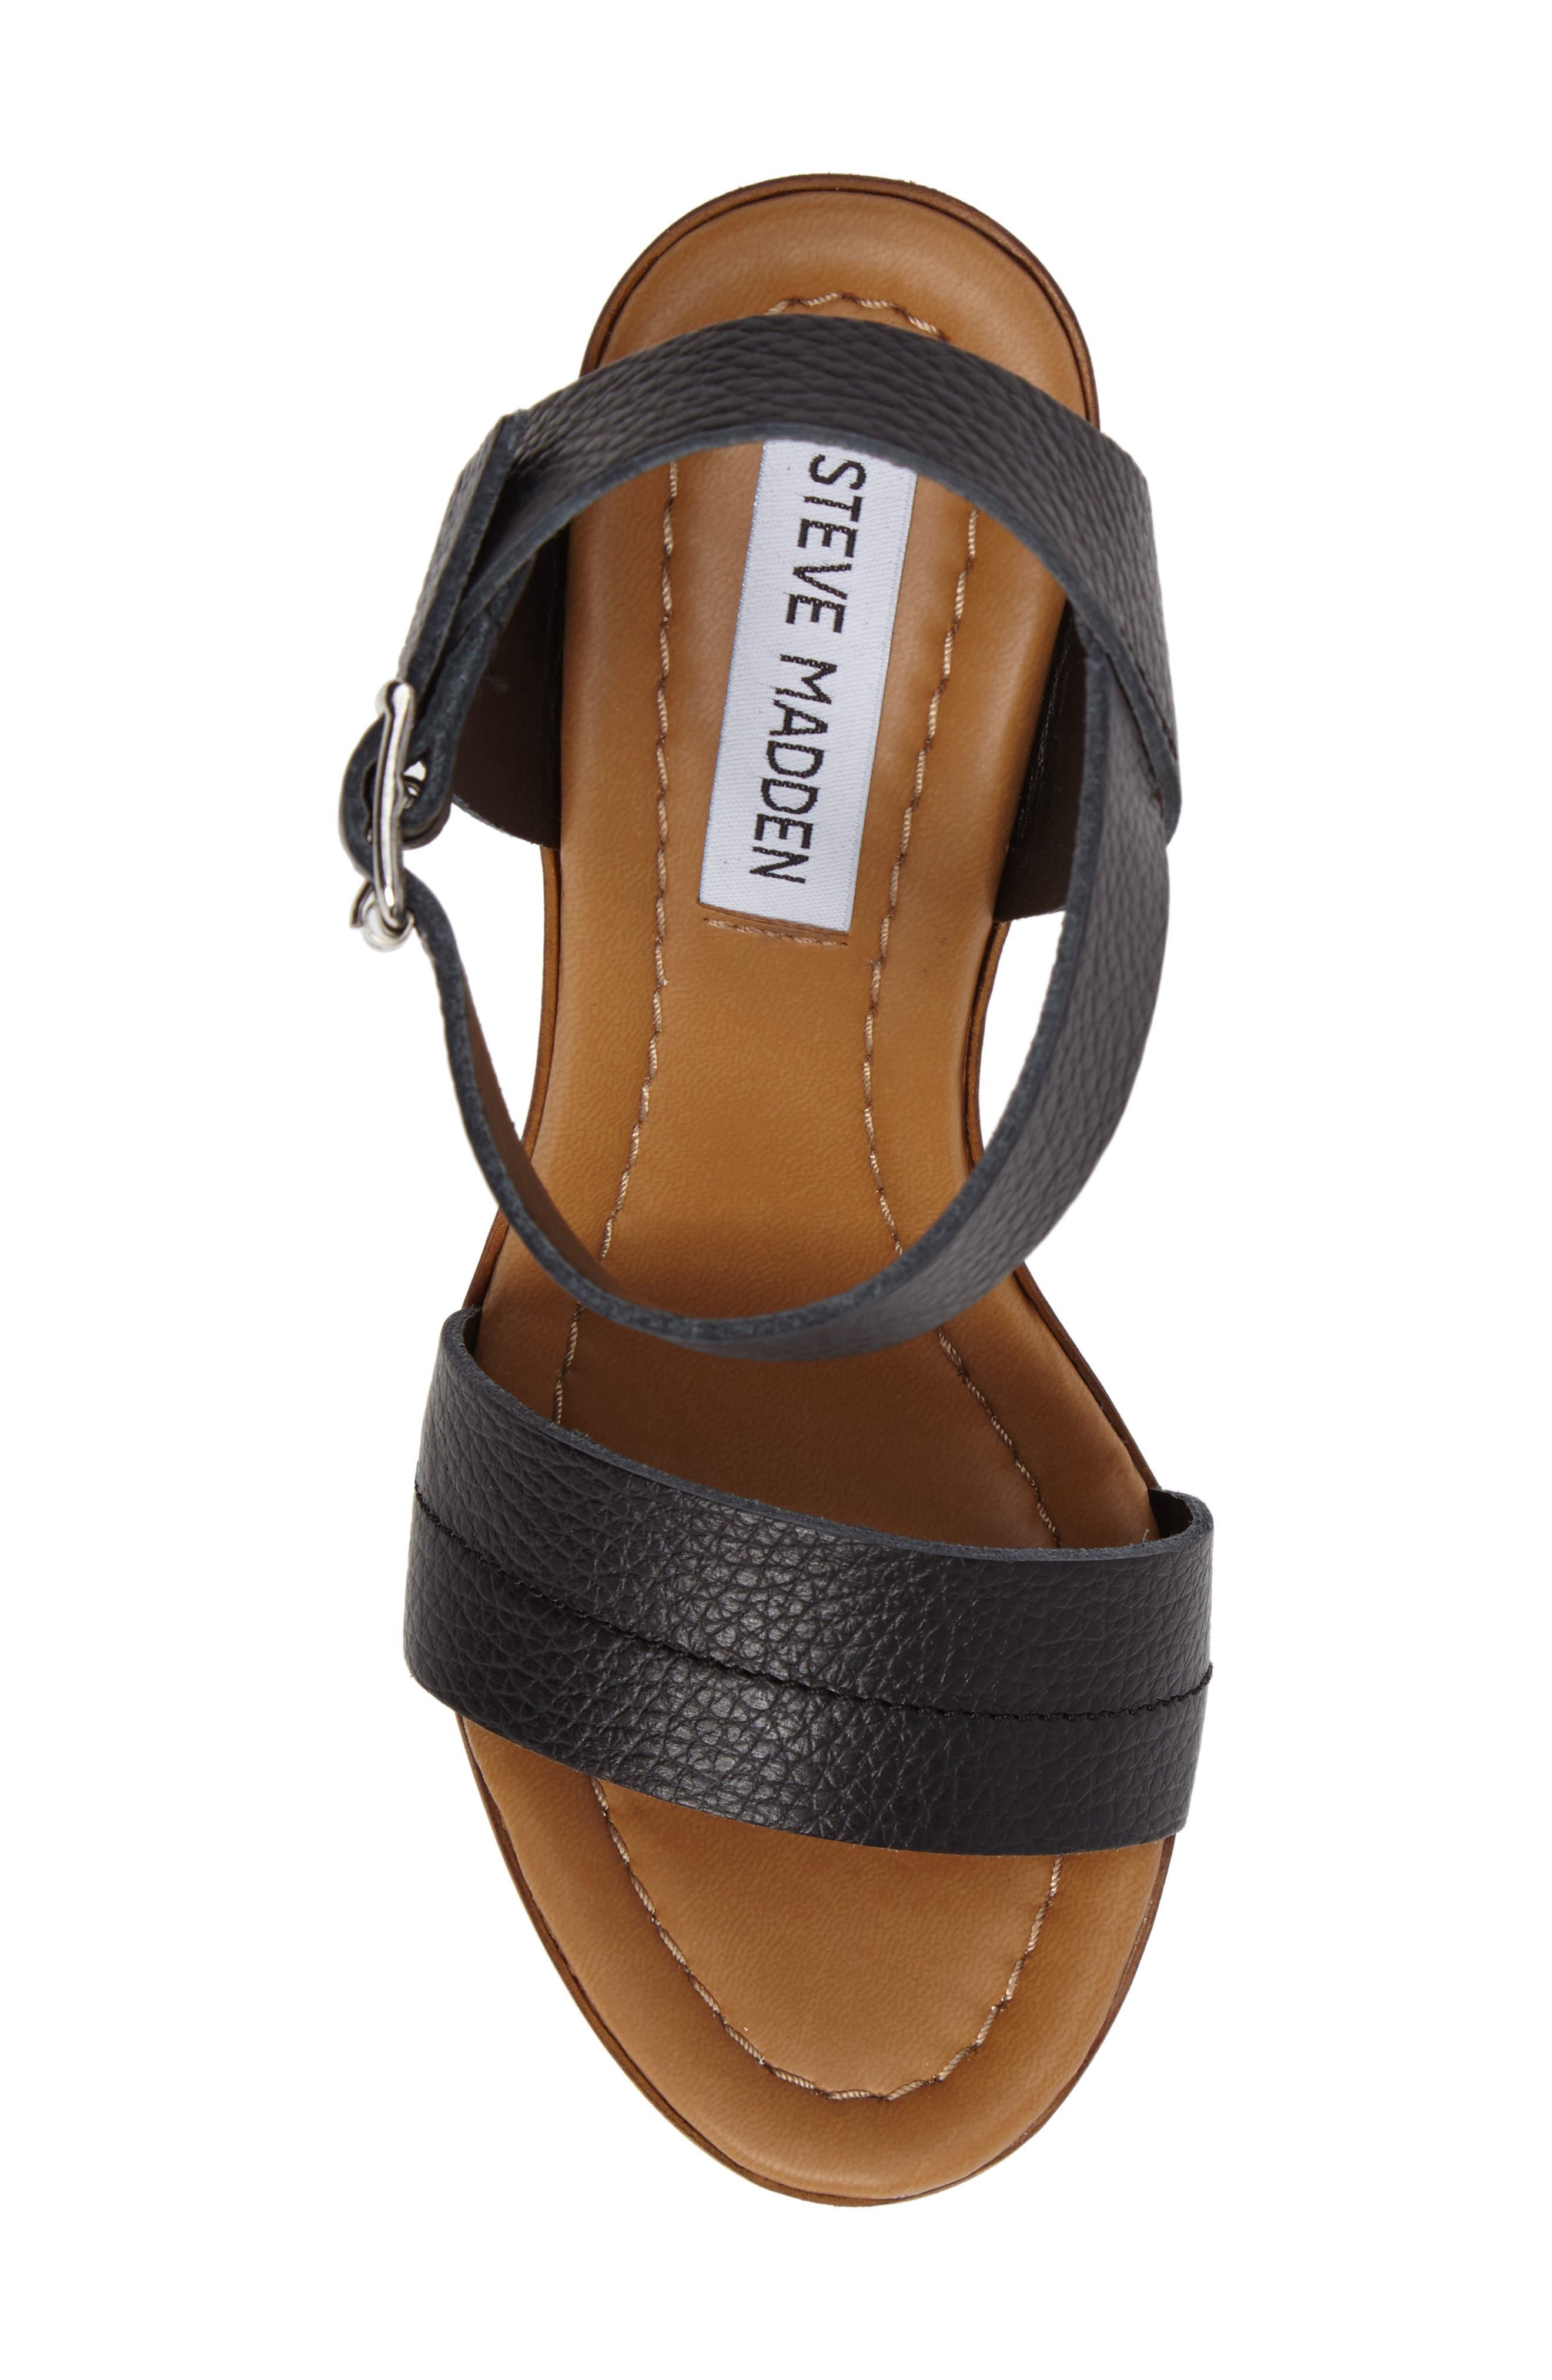 Belma Wedge Sandal,                             Alternate thumbnail 5, color,                             Black Leather